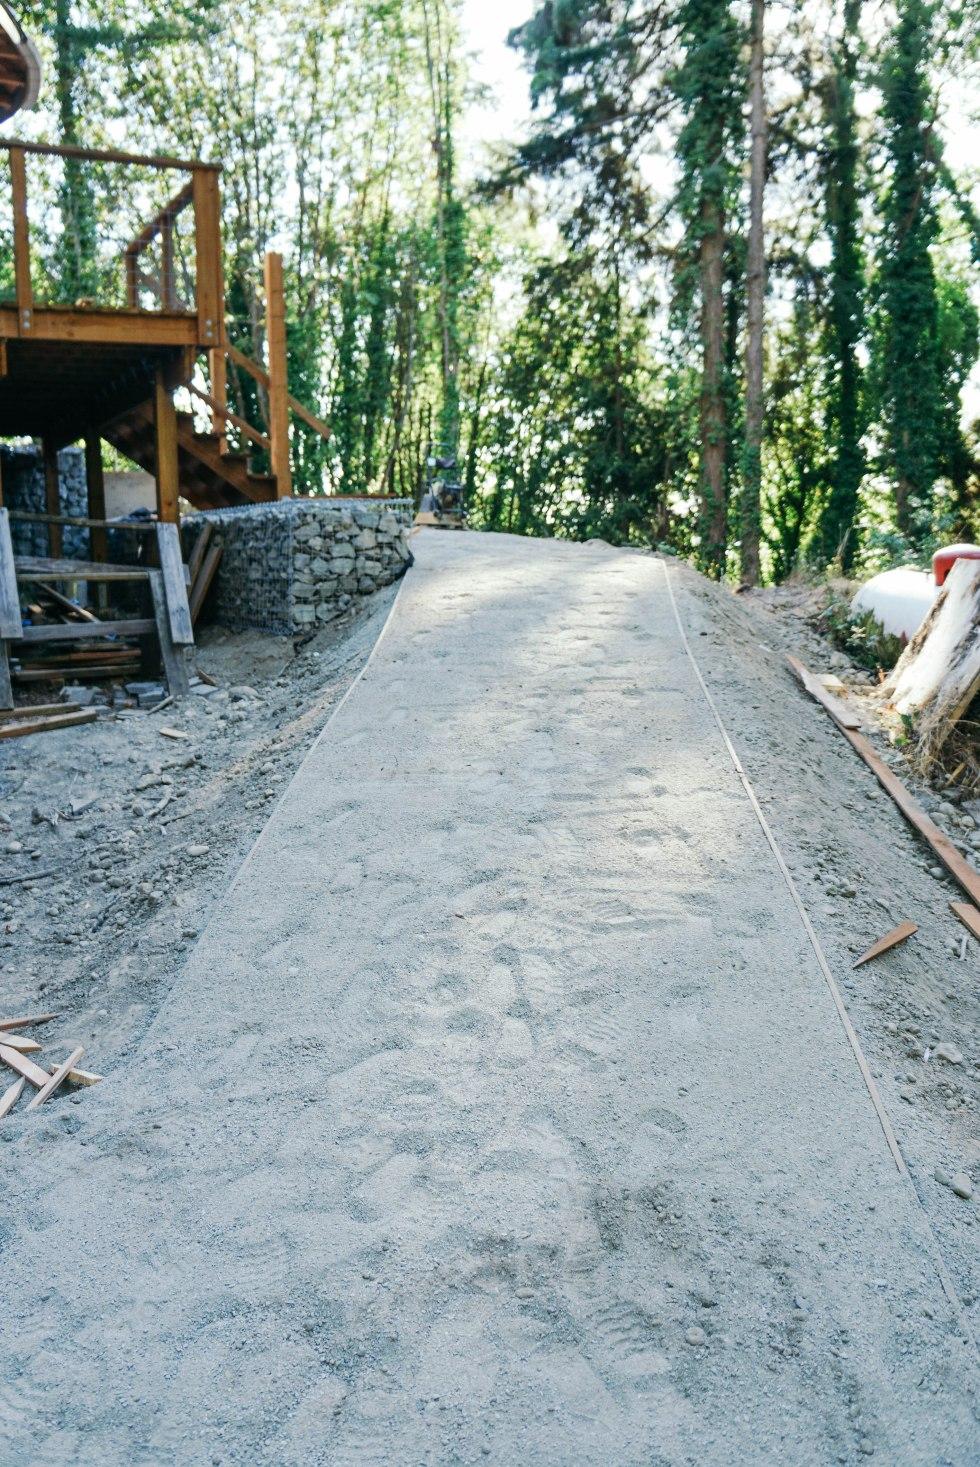 Graveled path